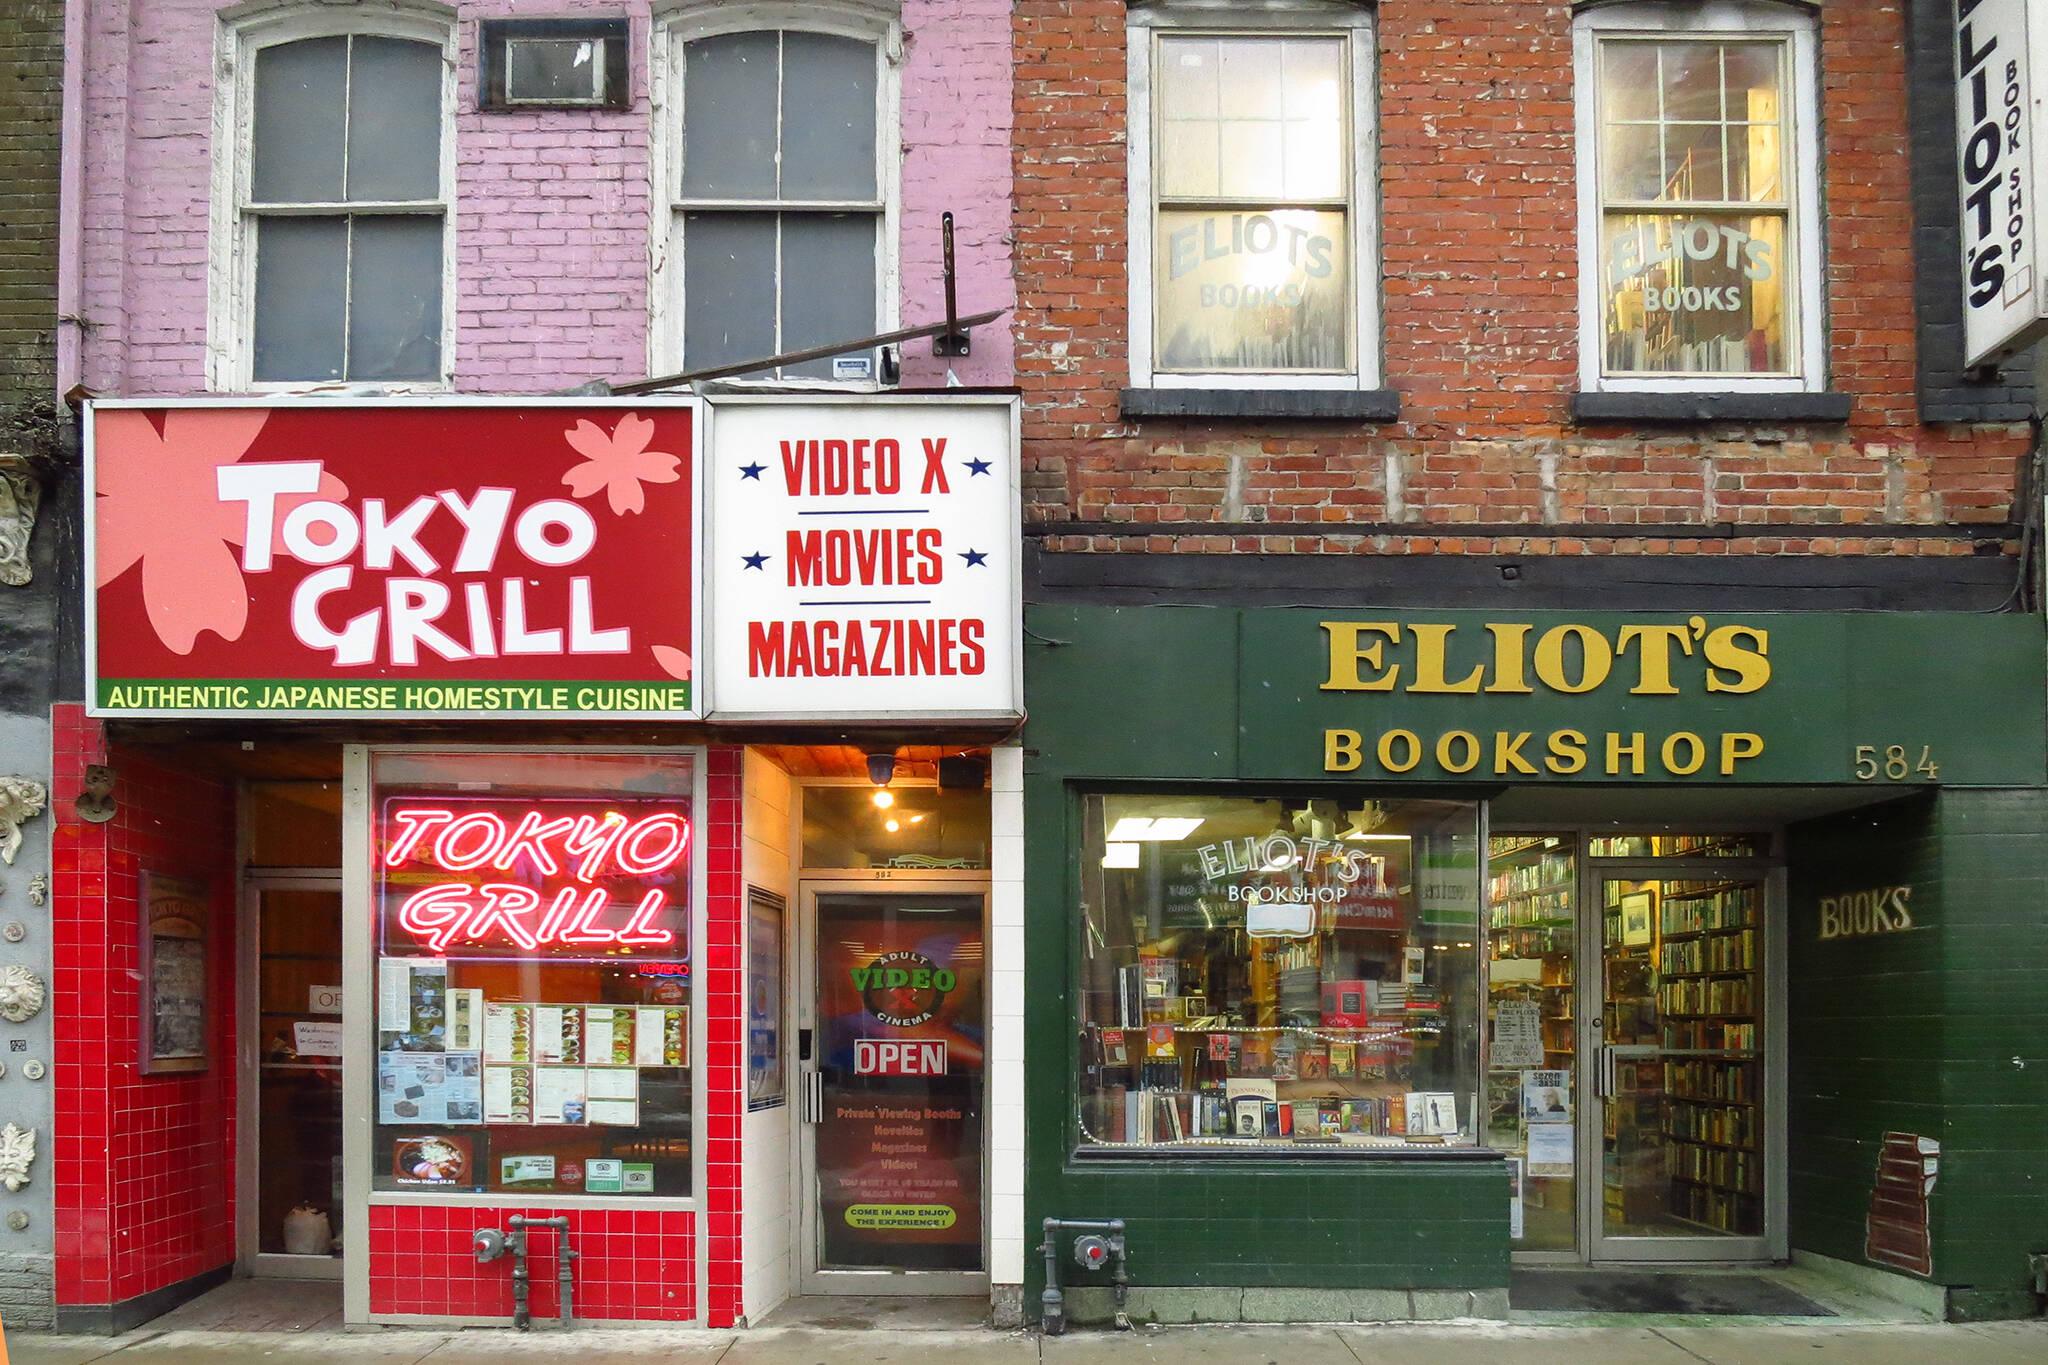 eliots bookshop toronto